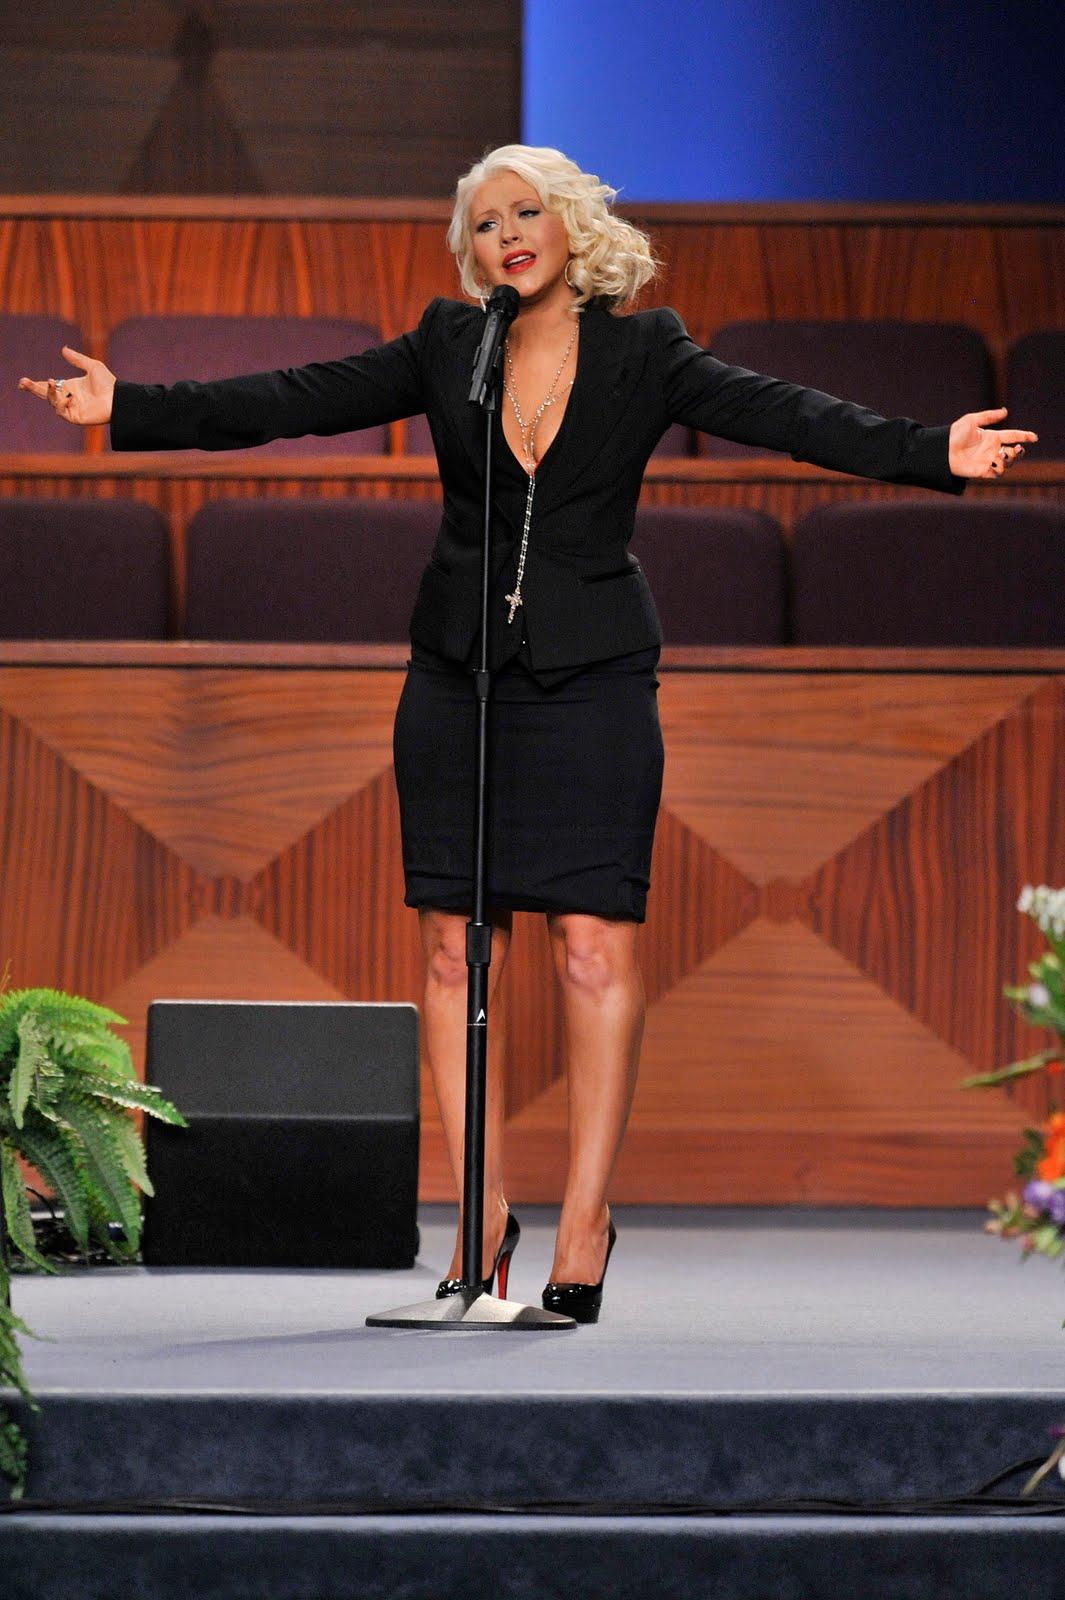 http://2.bp.blogspot.com/-OAYoAGeErQU/TyVkor20wpI/AAAAAAAAC3E/J0n2O8zEphg/s1600/etta-james-funeral-20120128-171703-477.jpg